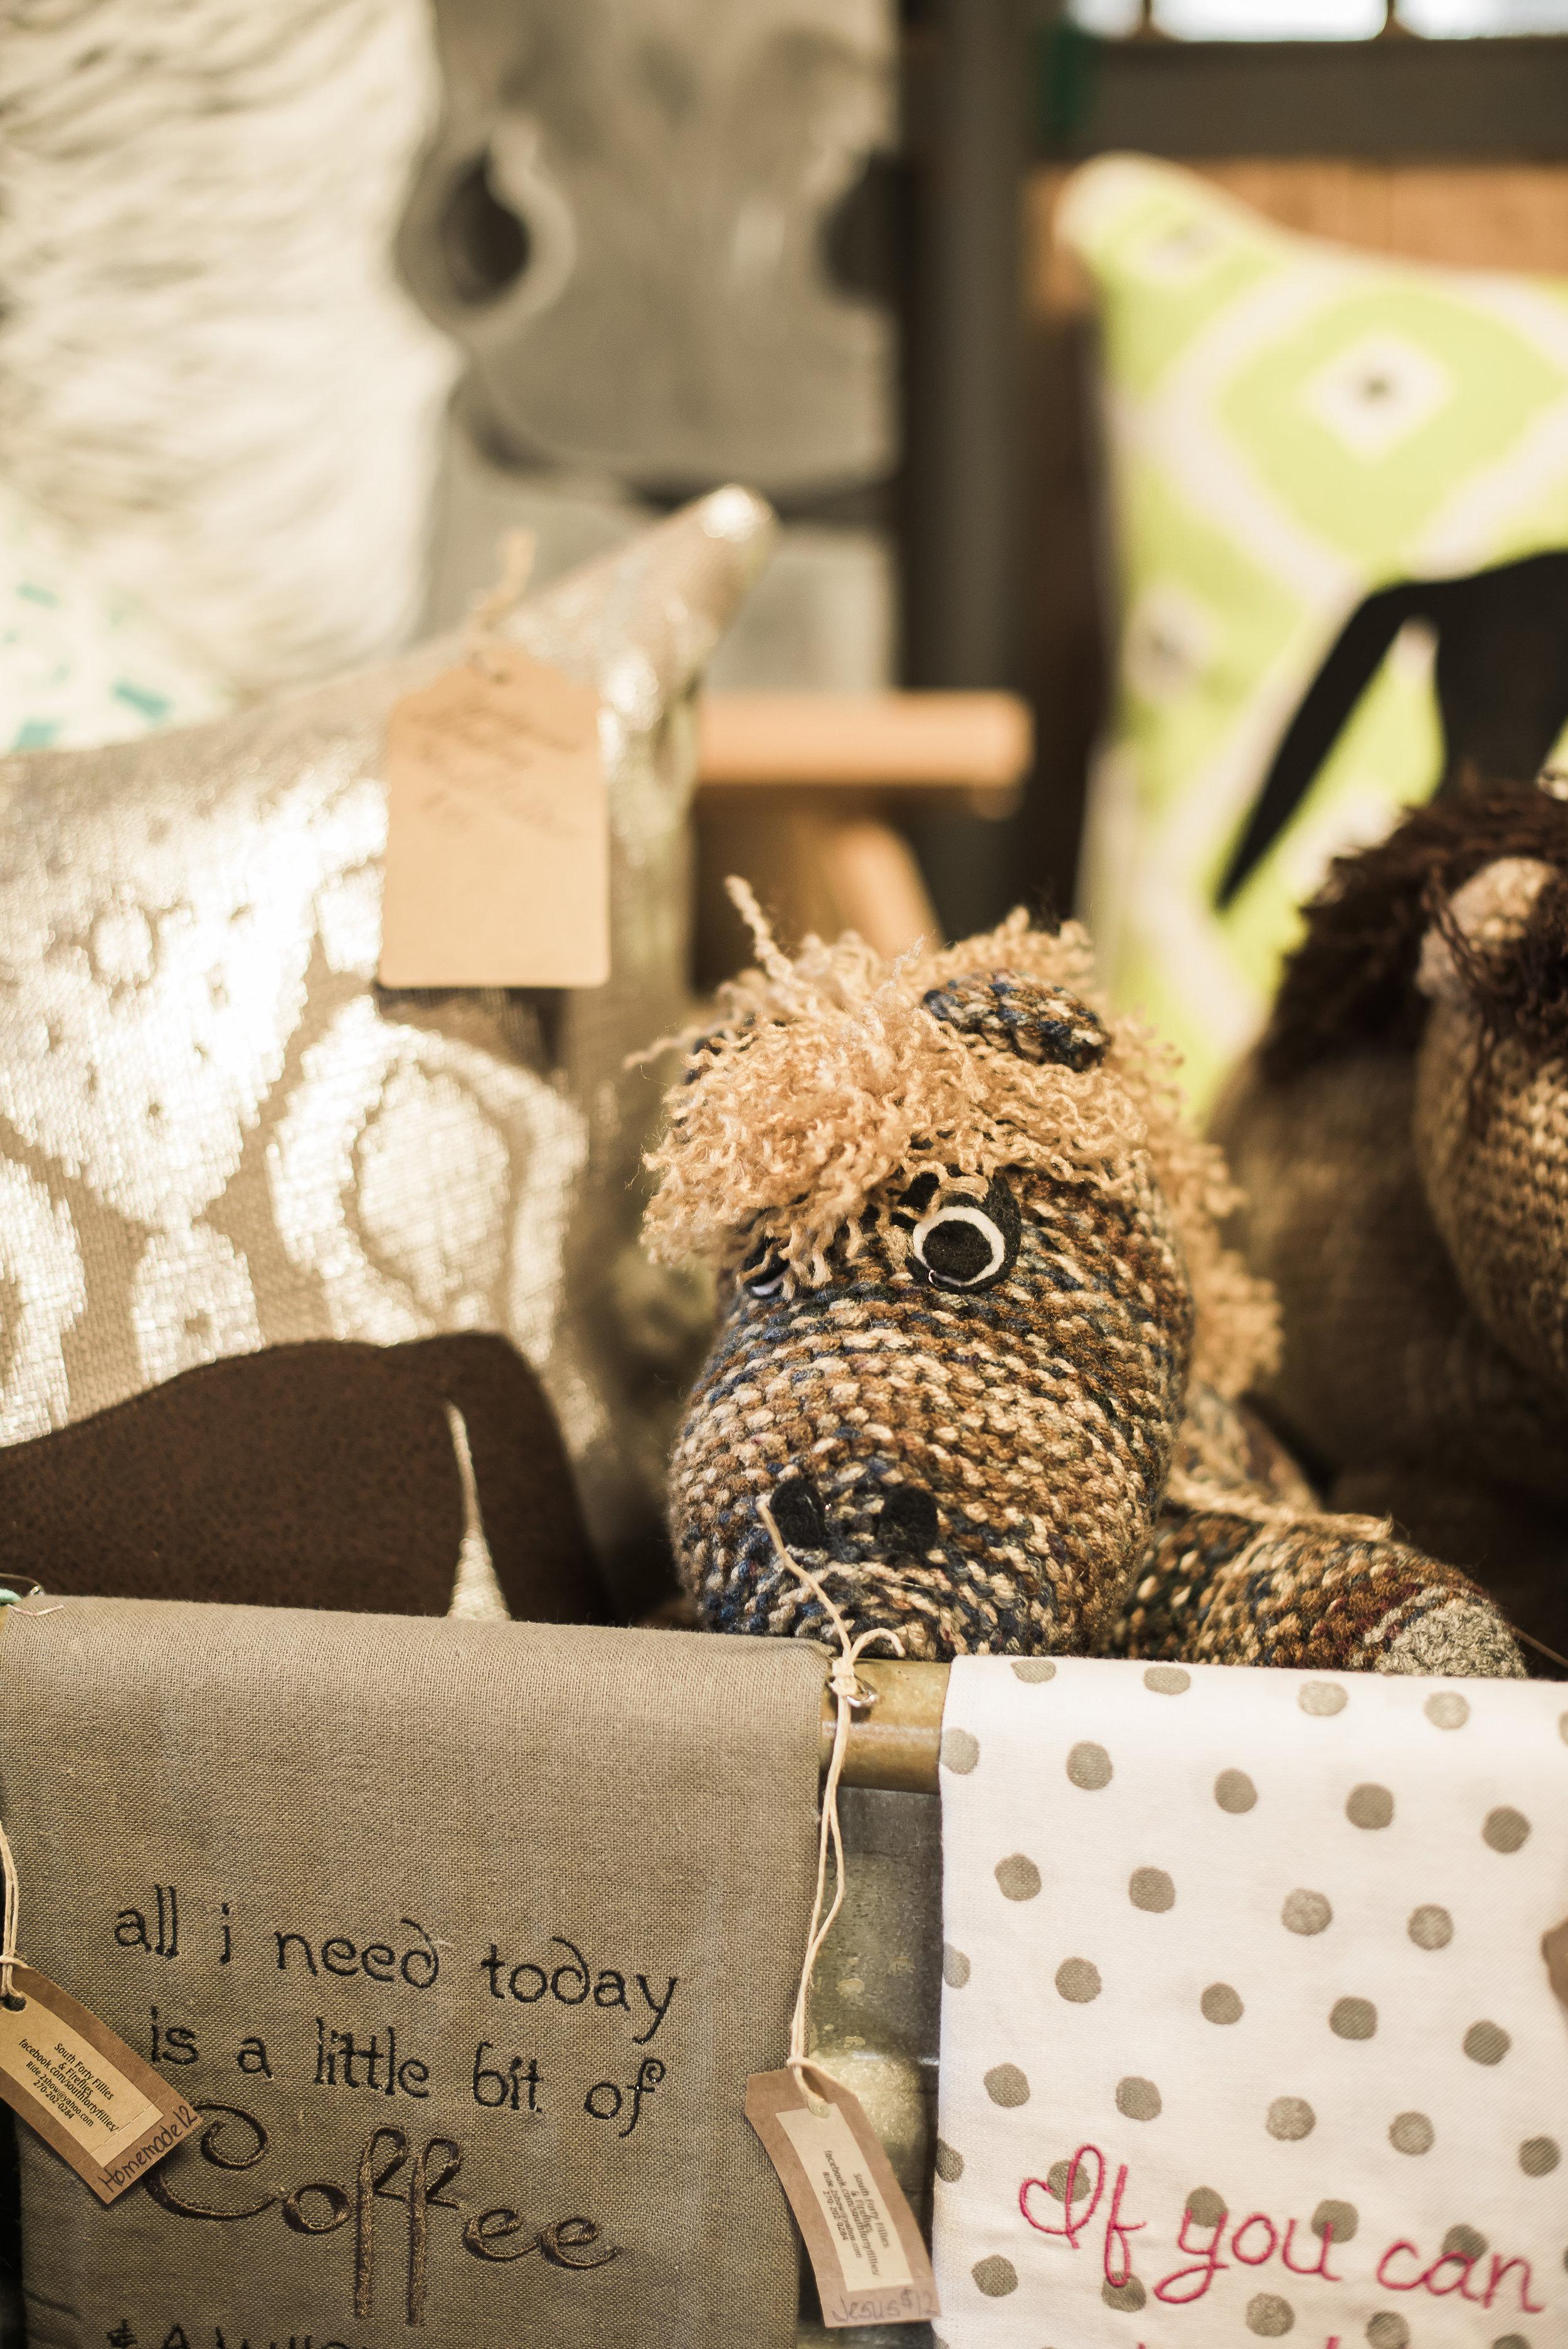 gypsymoonmarketplacebowlinggreenphotographercassieadkins_34.JPG